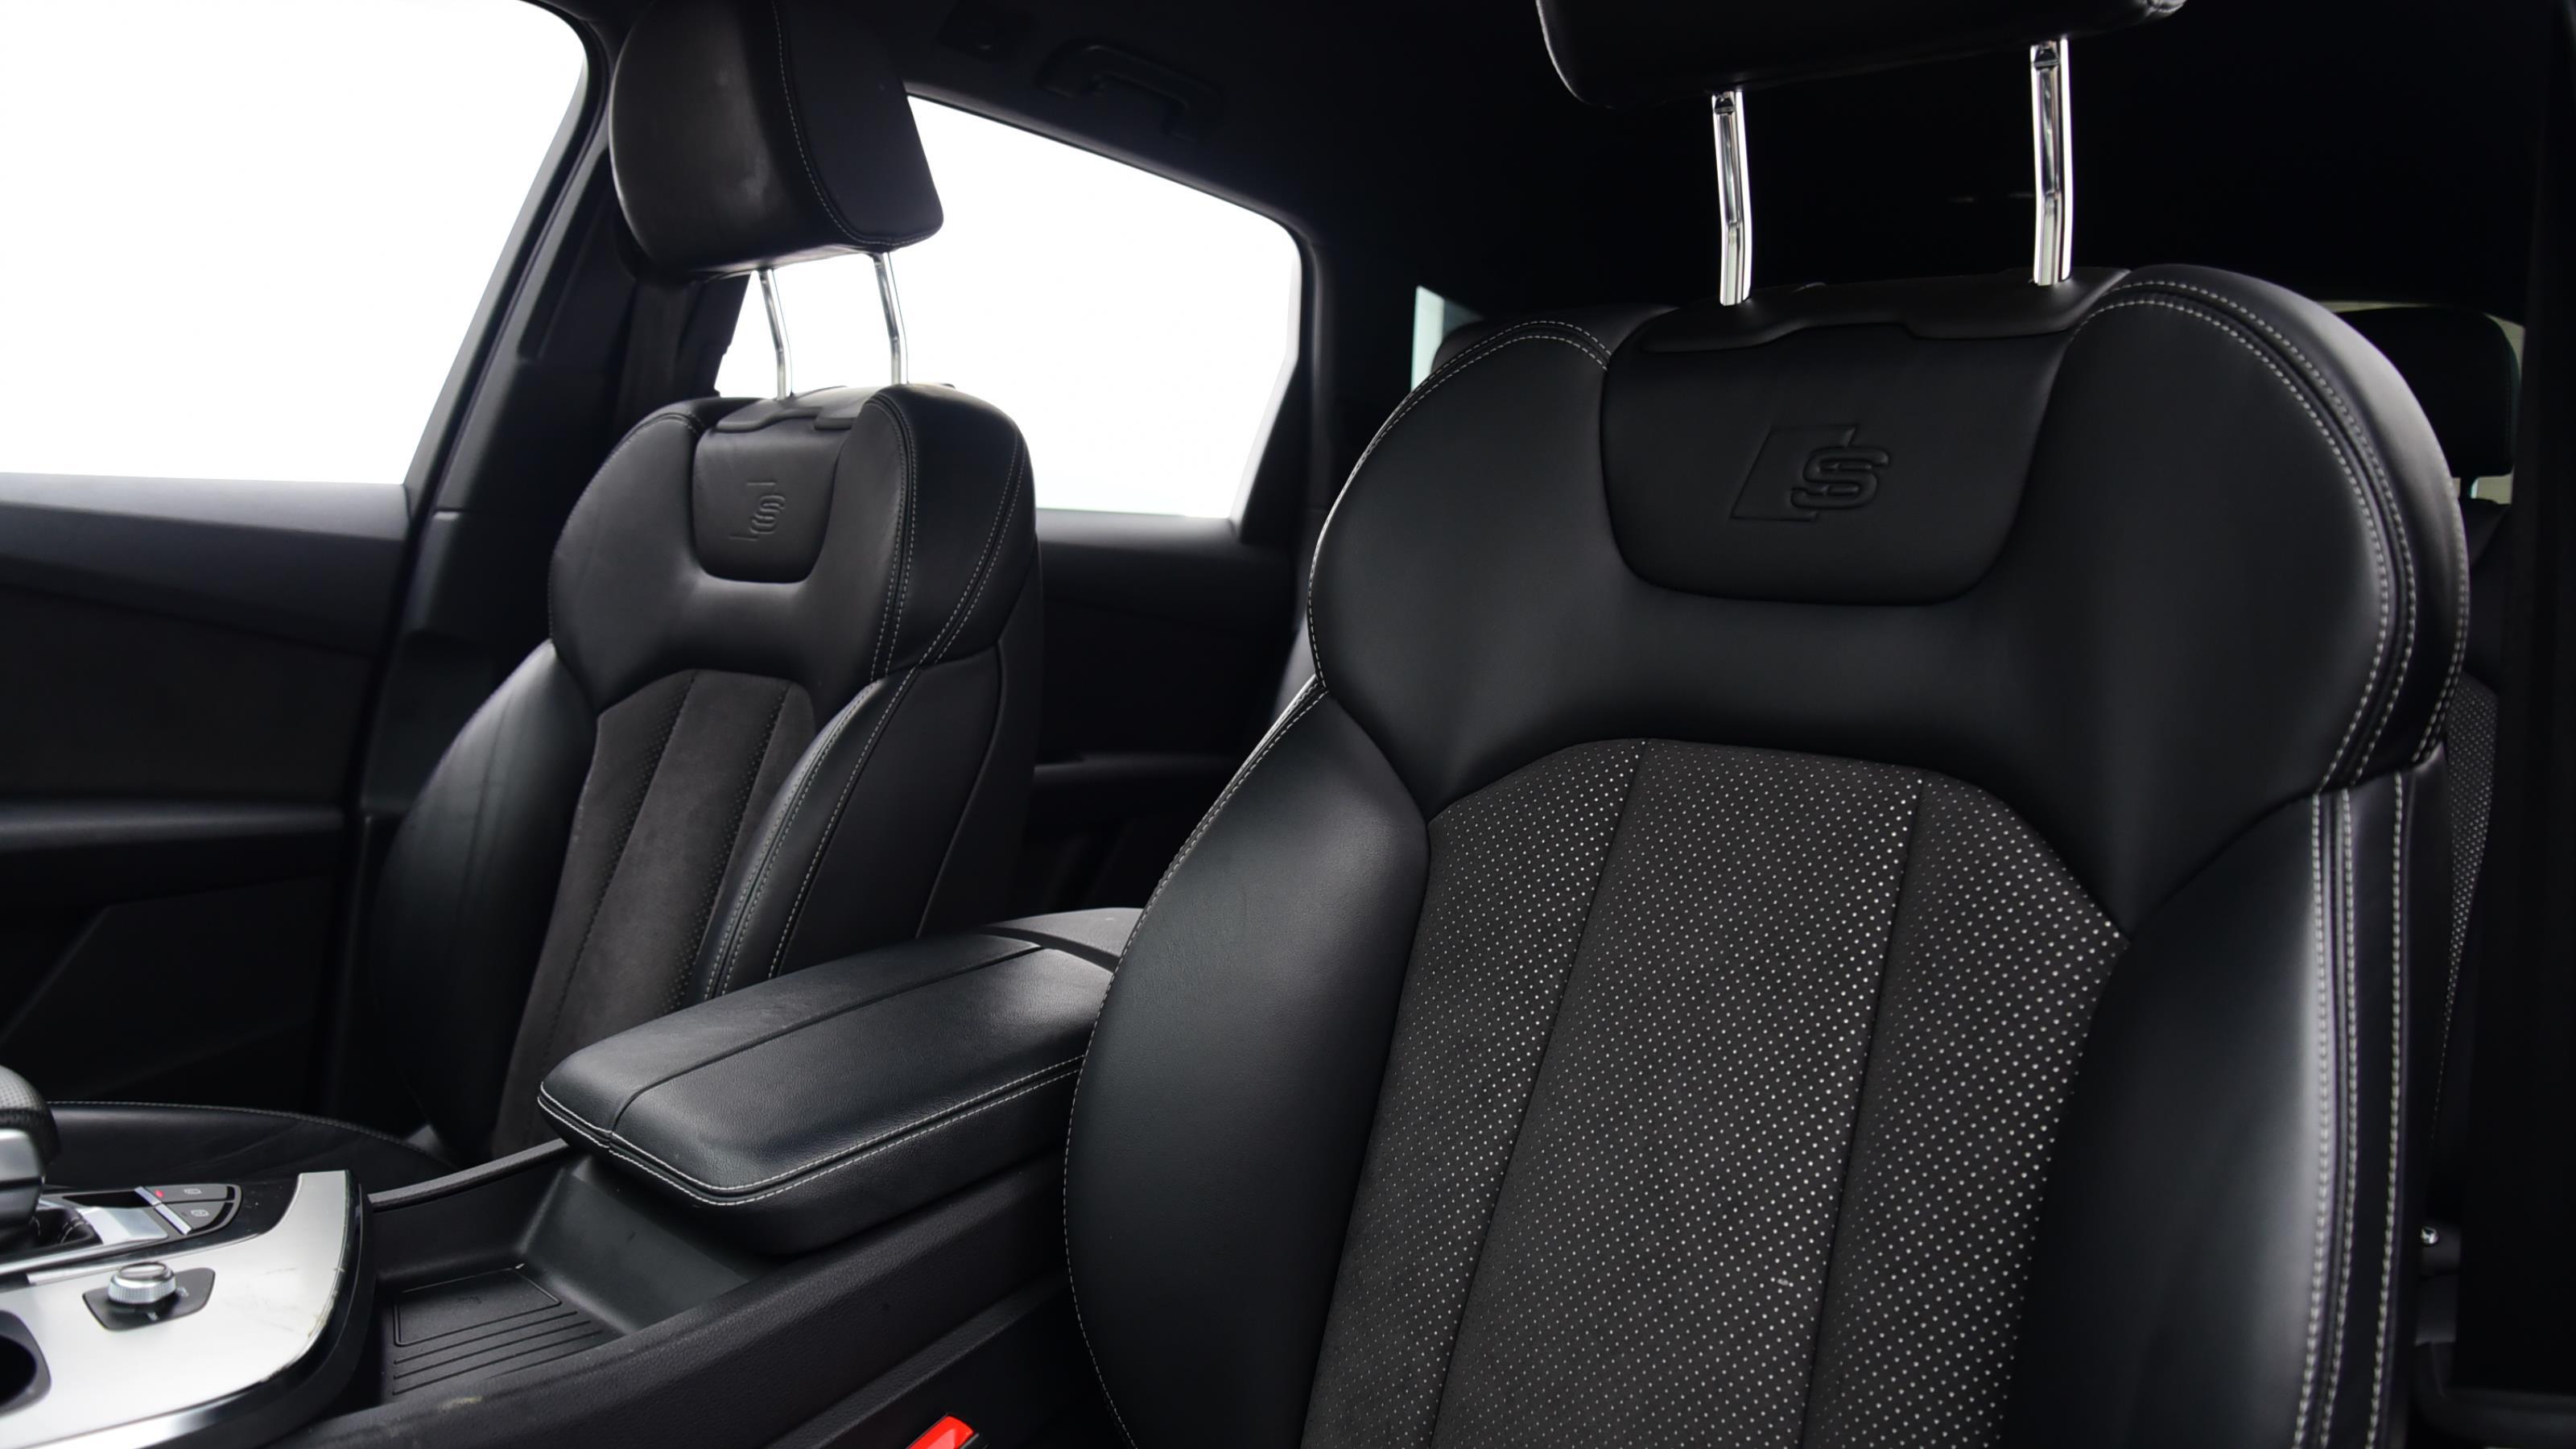 Used 2015 Audi Q7 3.0 TDI Quattro S Line 5dr Tip Auto GREY at Saxton4x4